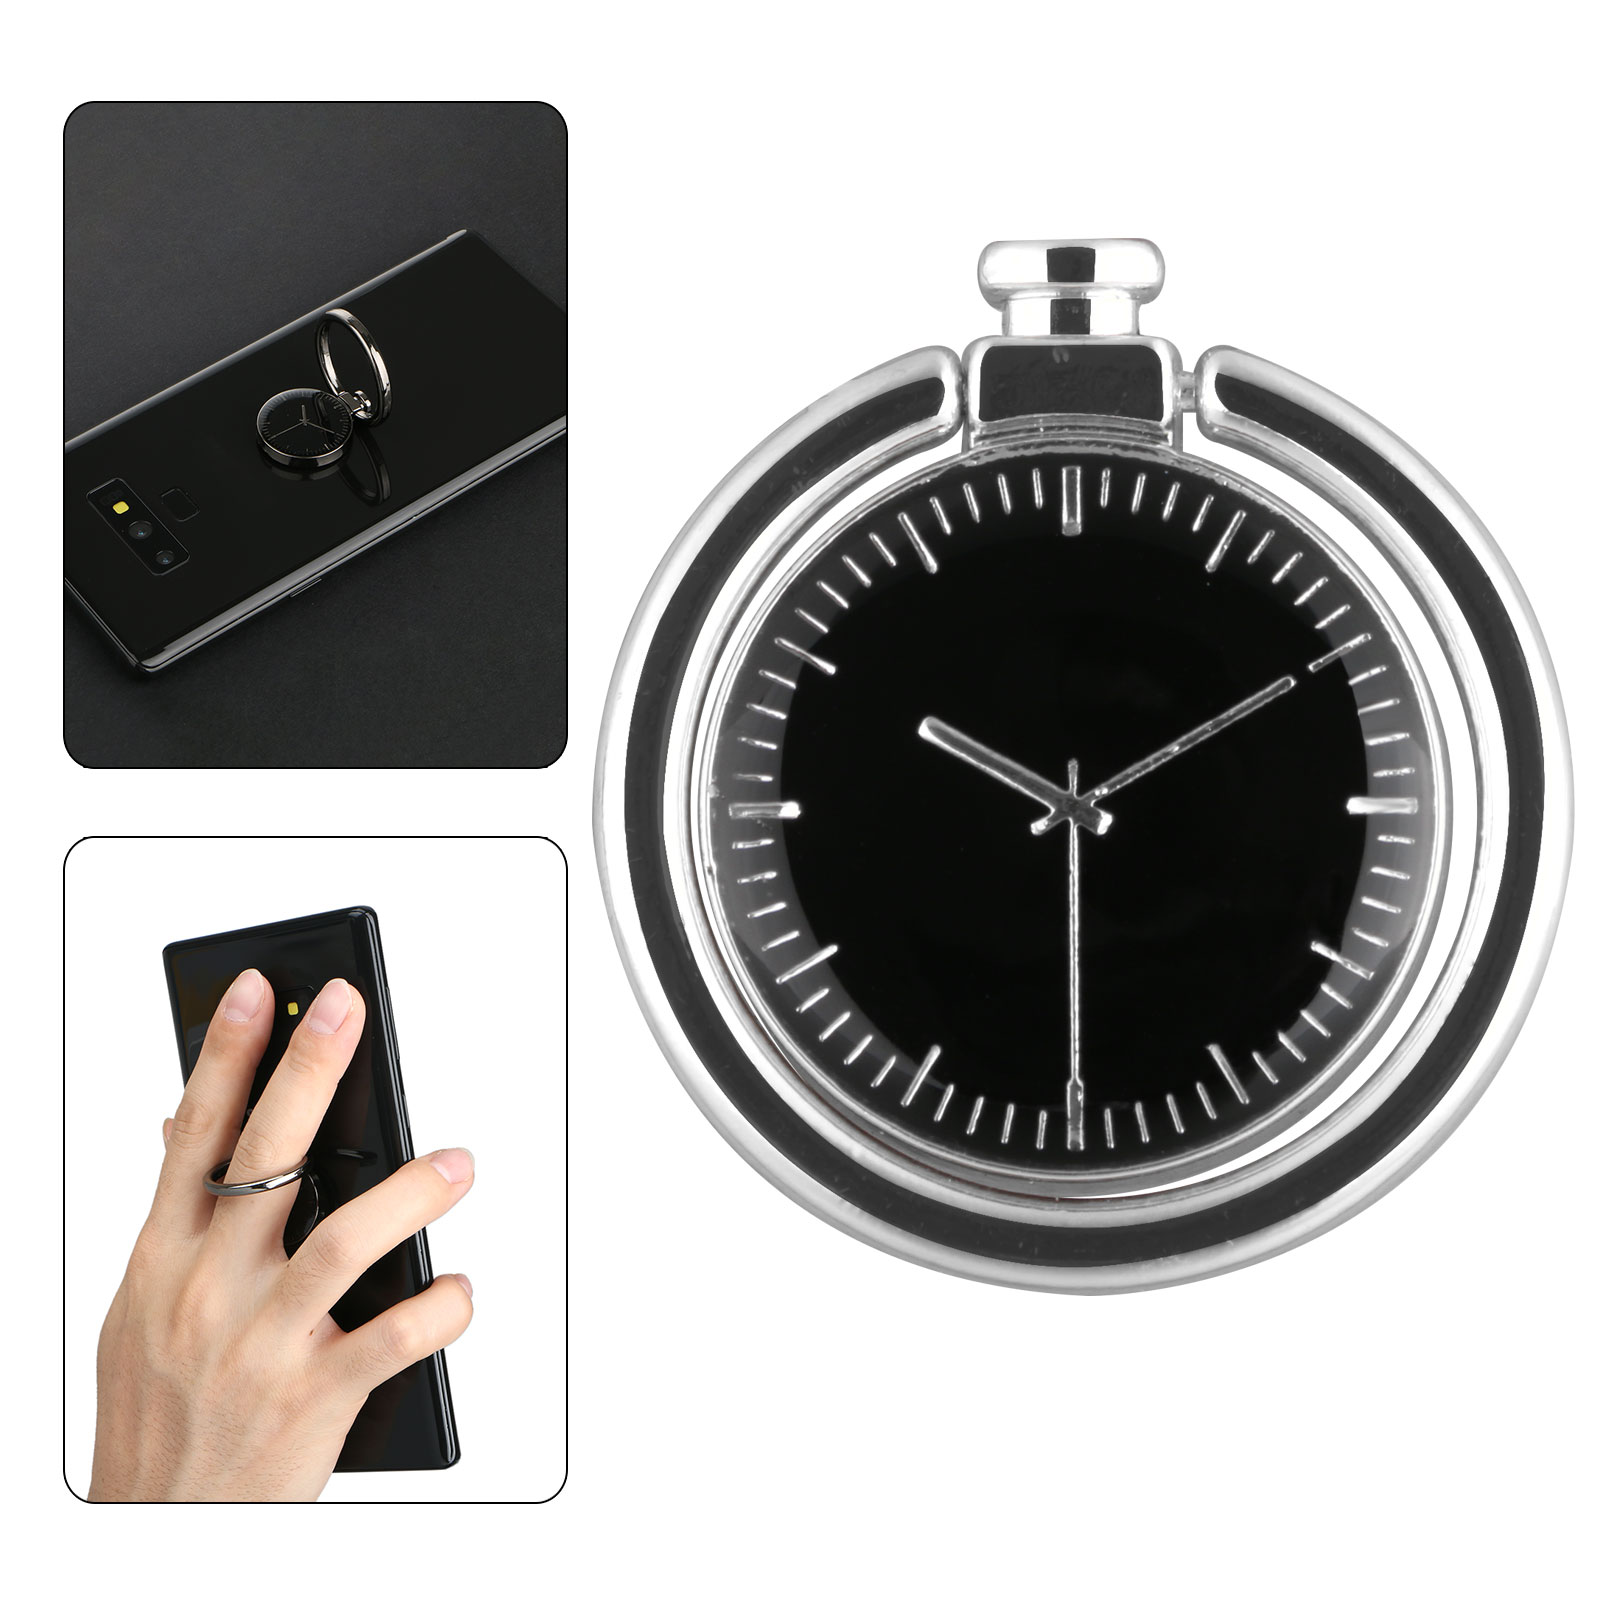 EEEKit Phone Finger Ring Stand, 180° Fold Universal Magnetic Nonslip Clock Design Ring Finger Holder Grip Mount Kickstand for Cell Phone